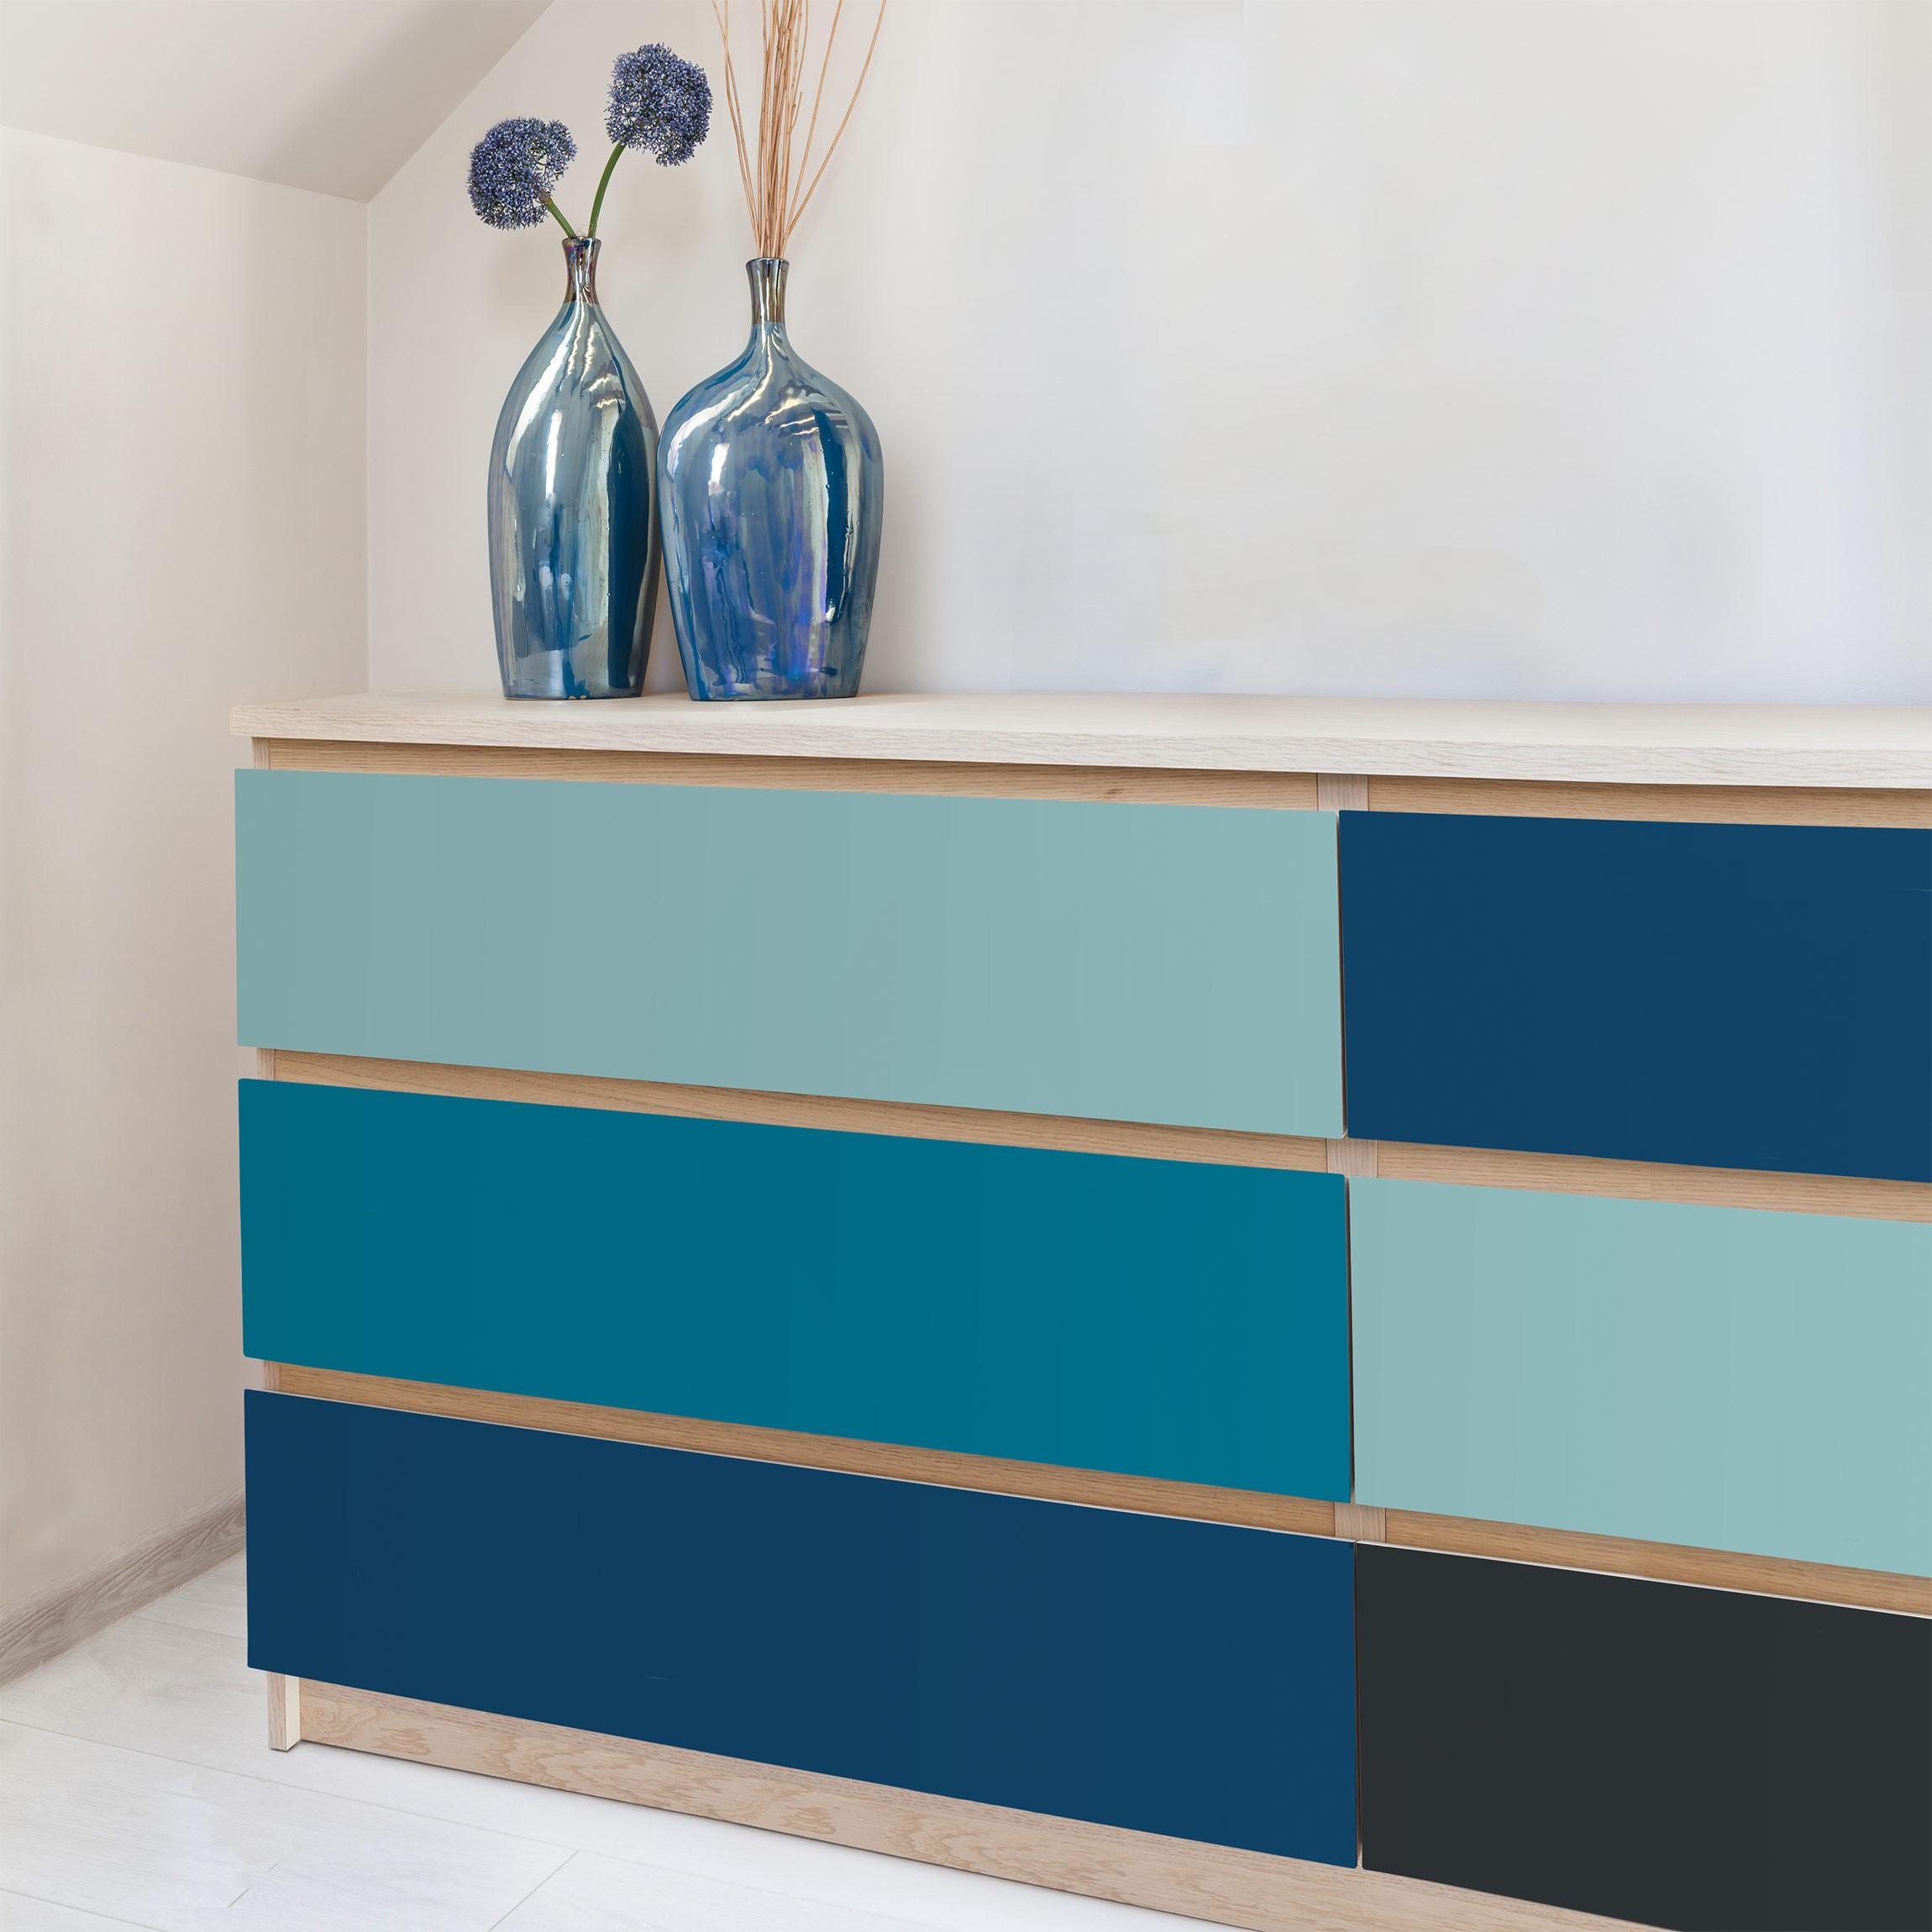 folie f r m bel tiefe see 4 farben set pastellt rkis petrol preussisch blau mondgrau. Black Bedroom Furniture Sets. Home Design Ideas